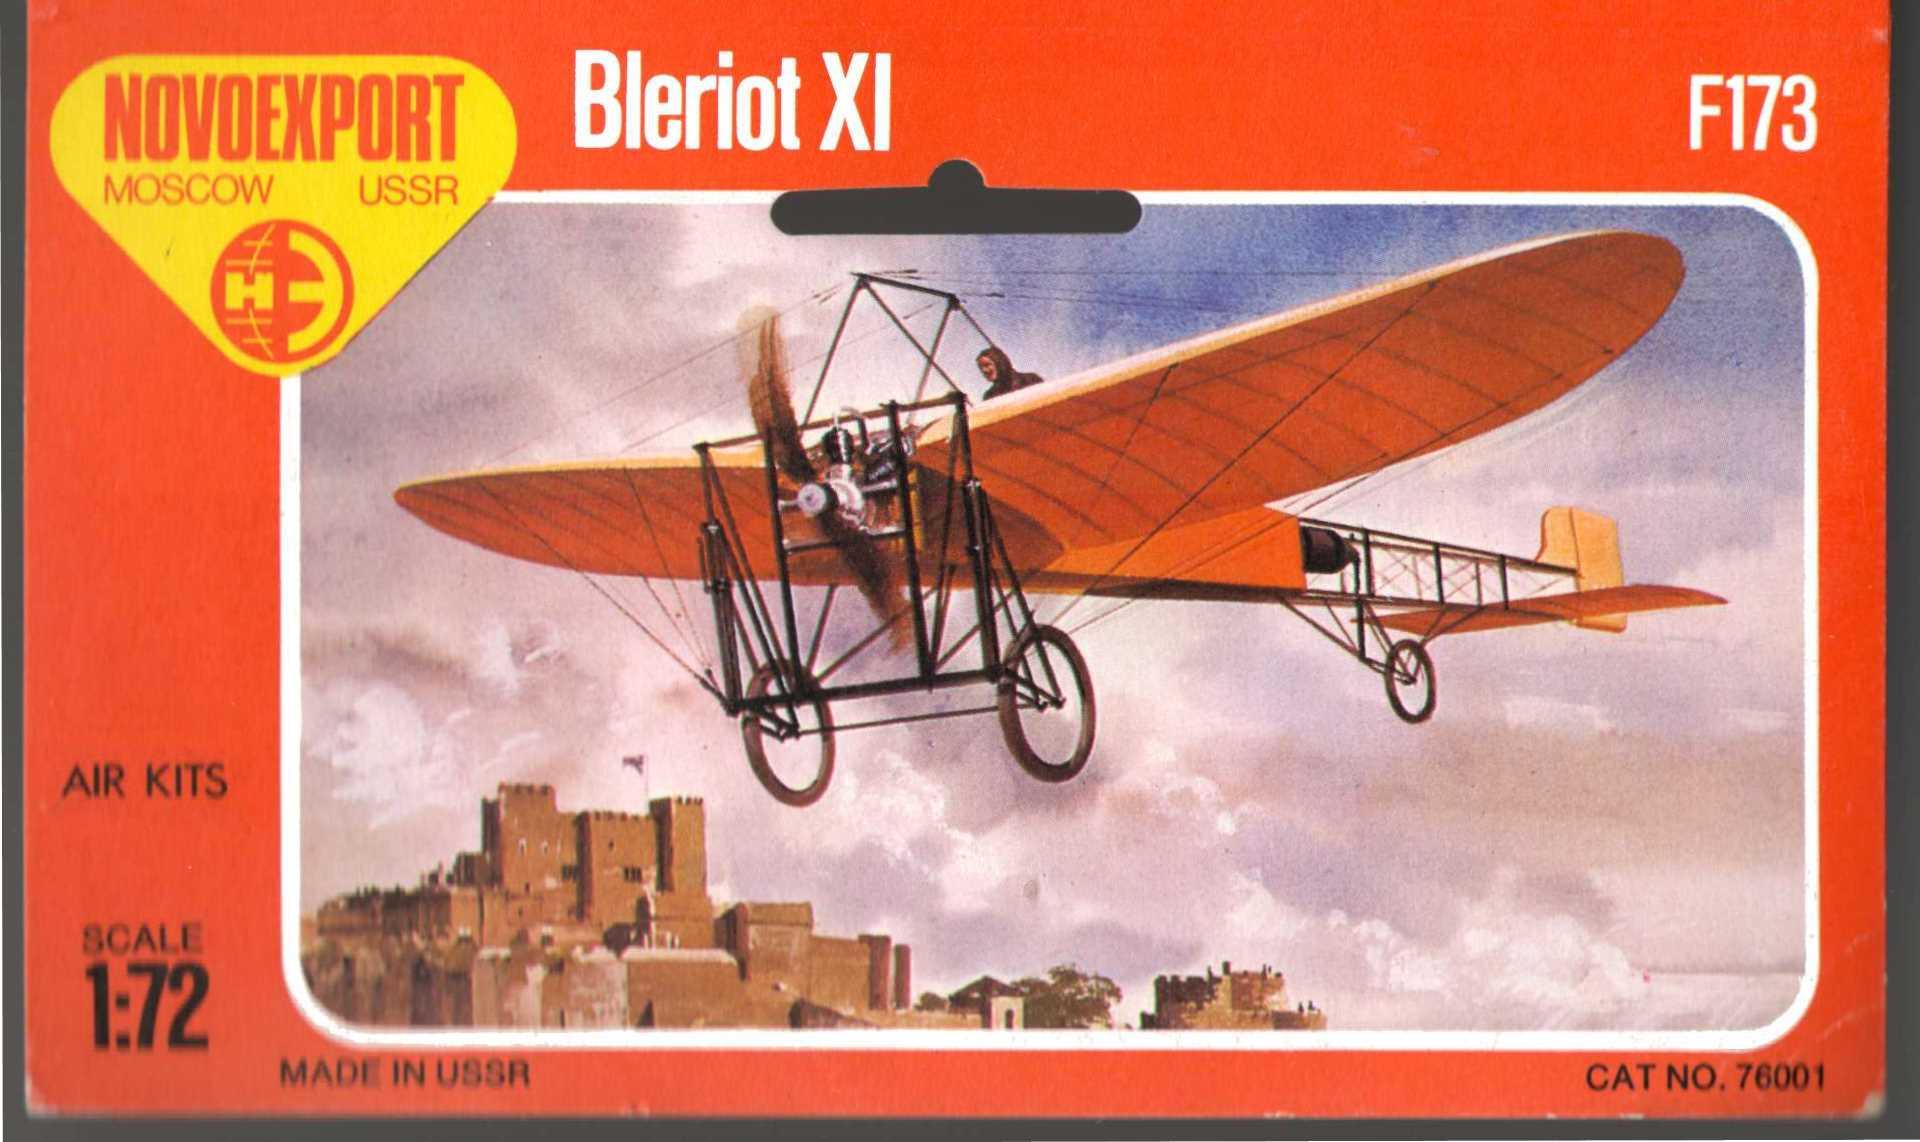 Лицевая сторона лепестка Novoexport F173 Bleriot XI